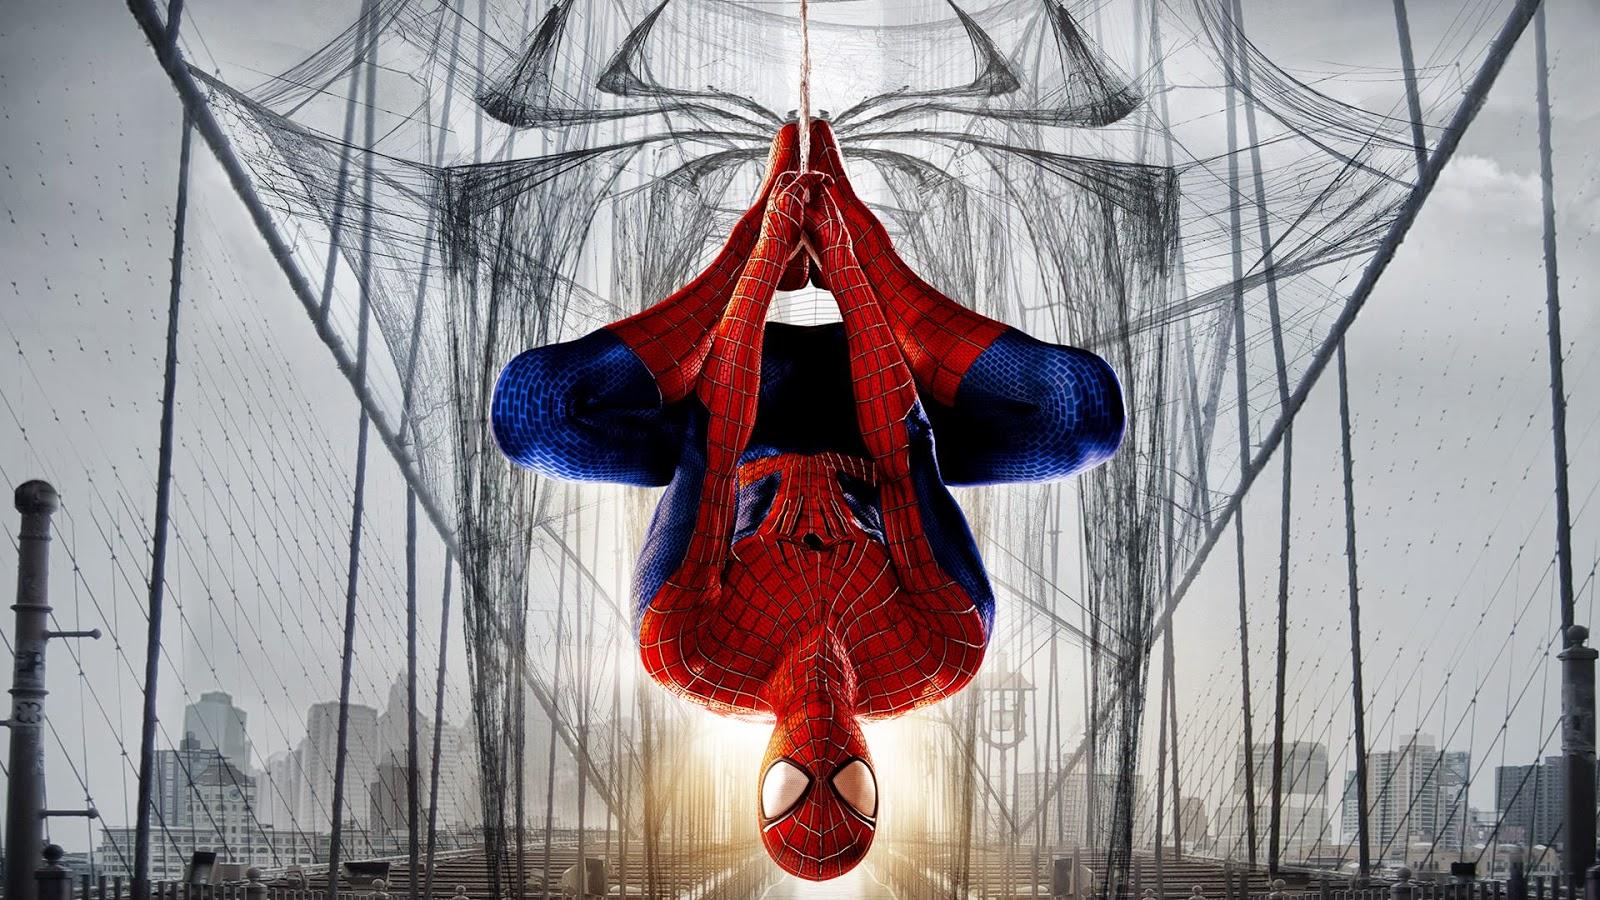 Hd wallpaper spiderman - Hd Wallpaper For Desktop Widescreen N Mobile Download Free Hd